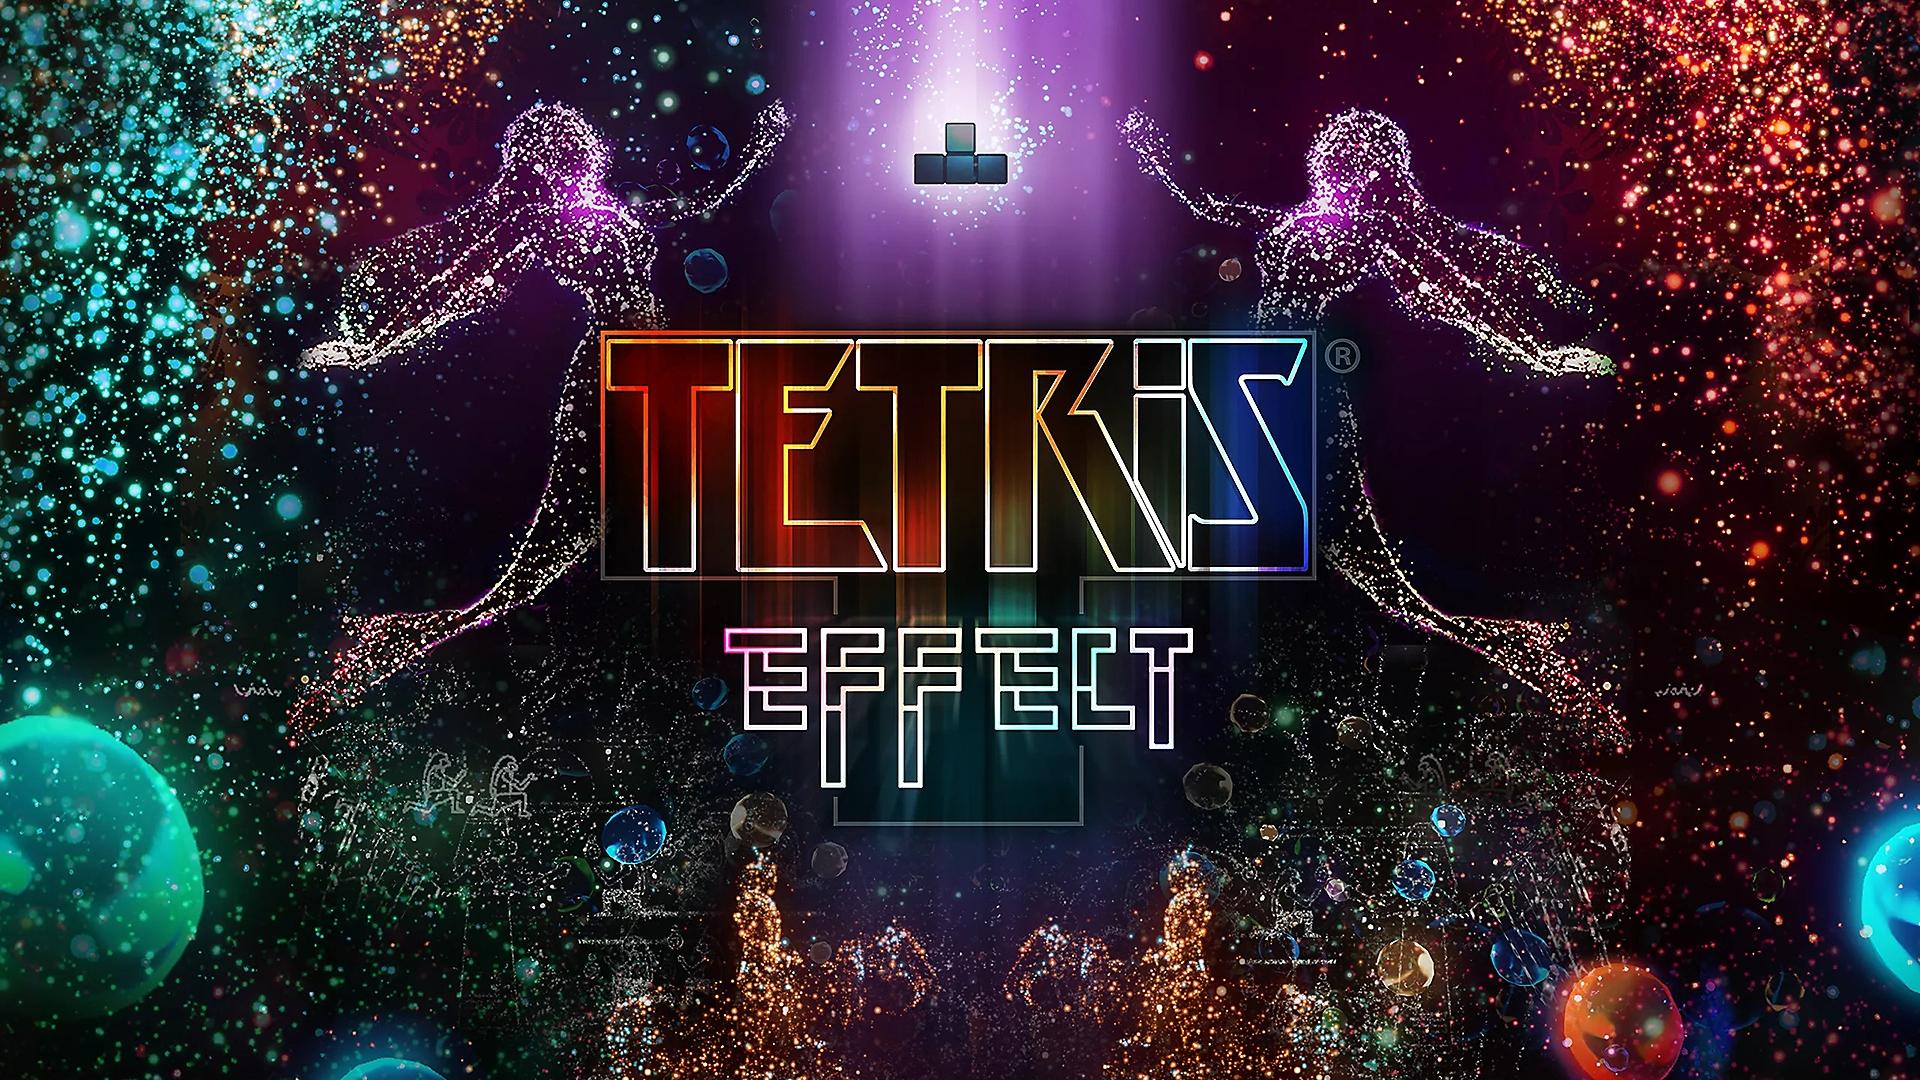 Tetris Effect - Launch Trailer | PS4